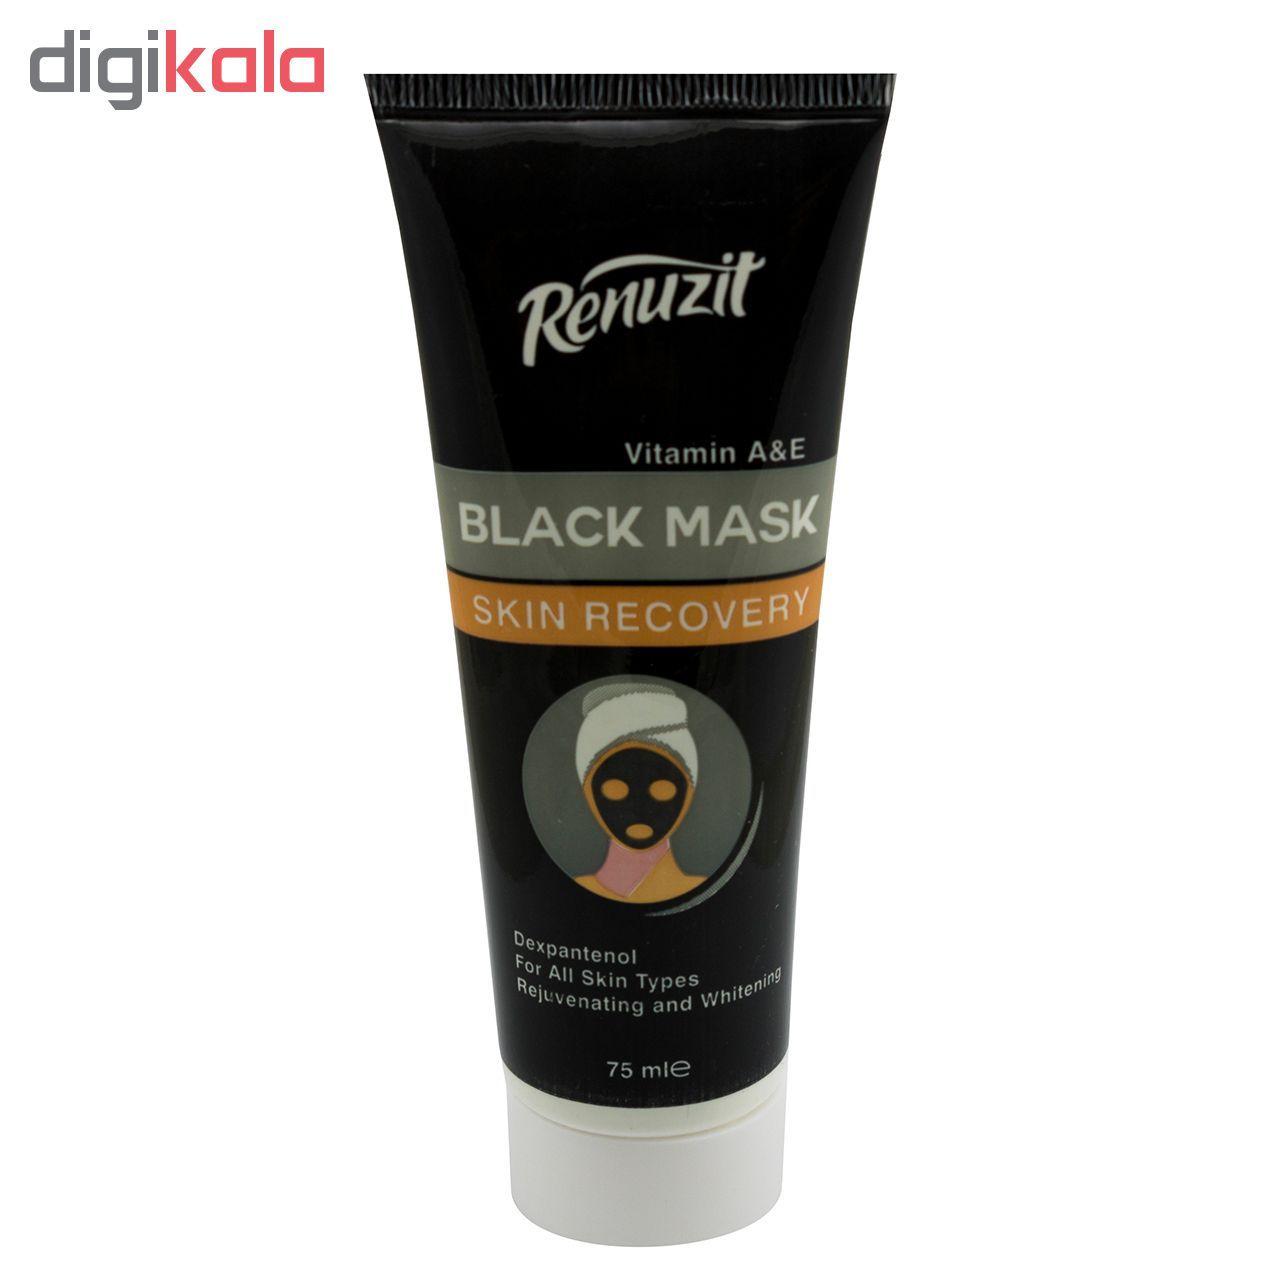 ماسک صورت رینو زیت مدل Black mask carbon active حجم 75 میلی لیتر main 1 1